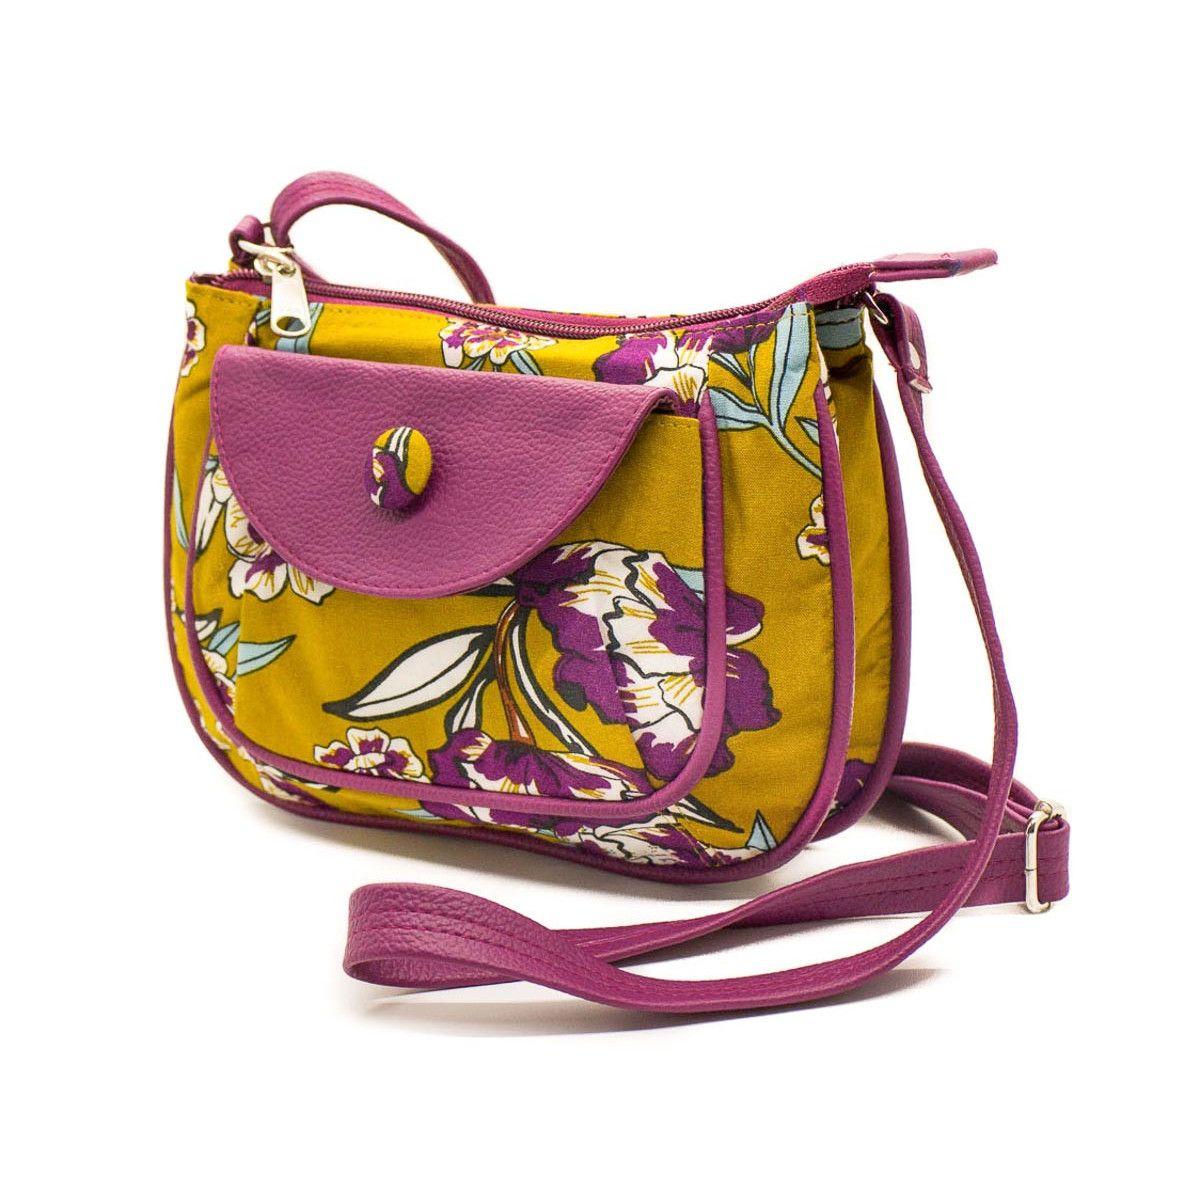 petit sac besace bandoulière tissu original jaune moutarde et fleurs rose violine